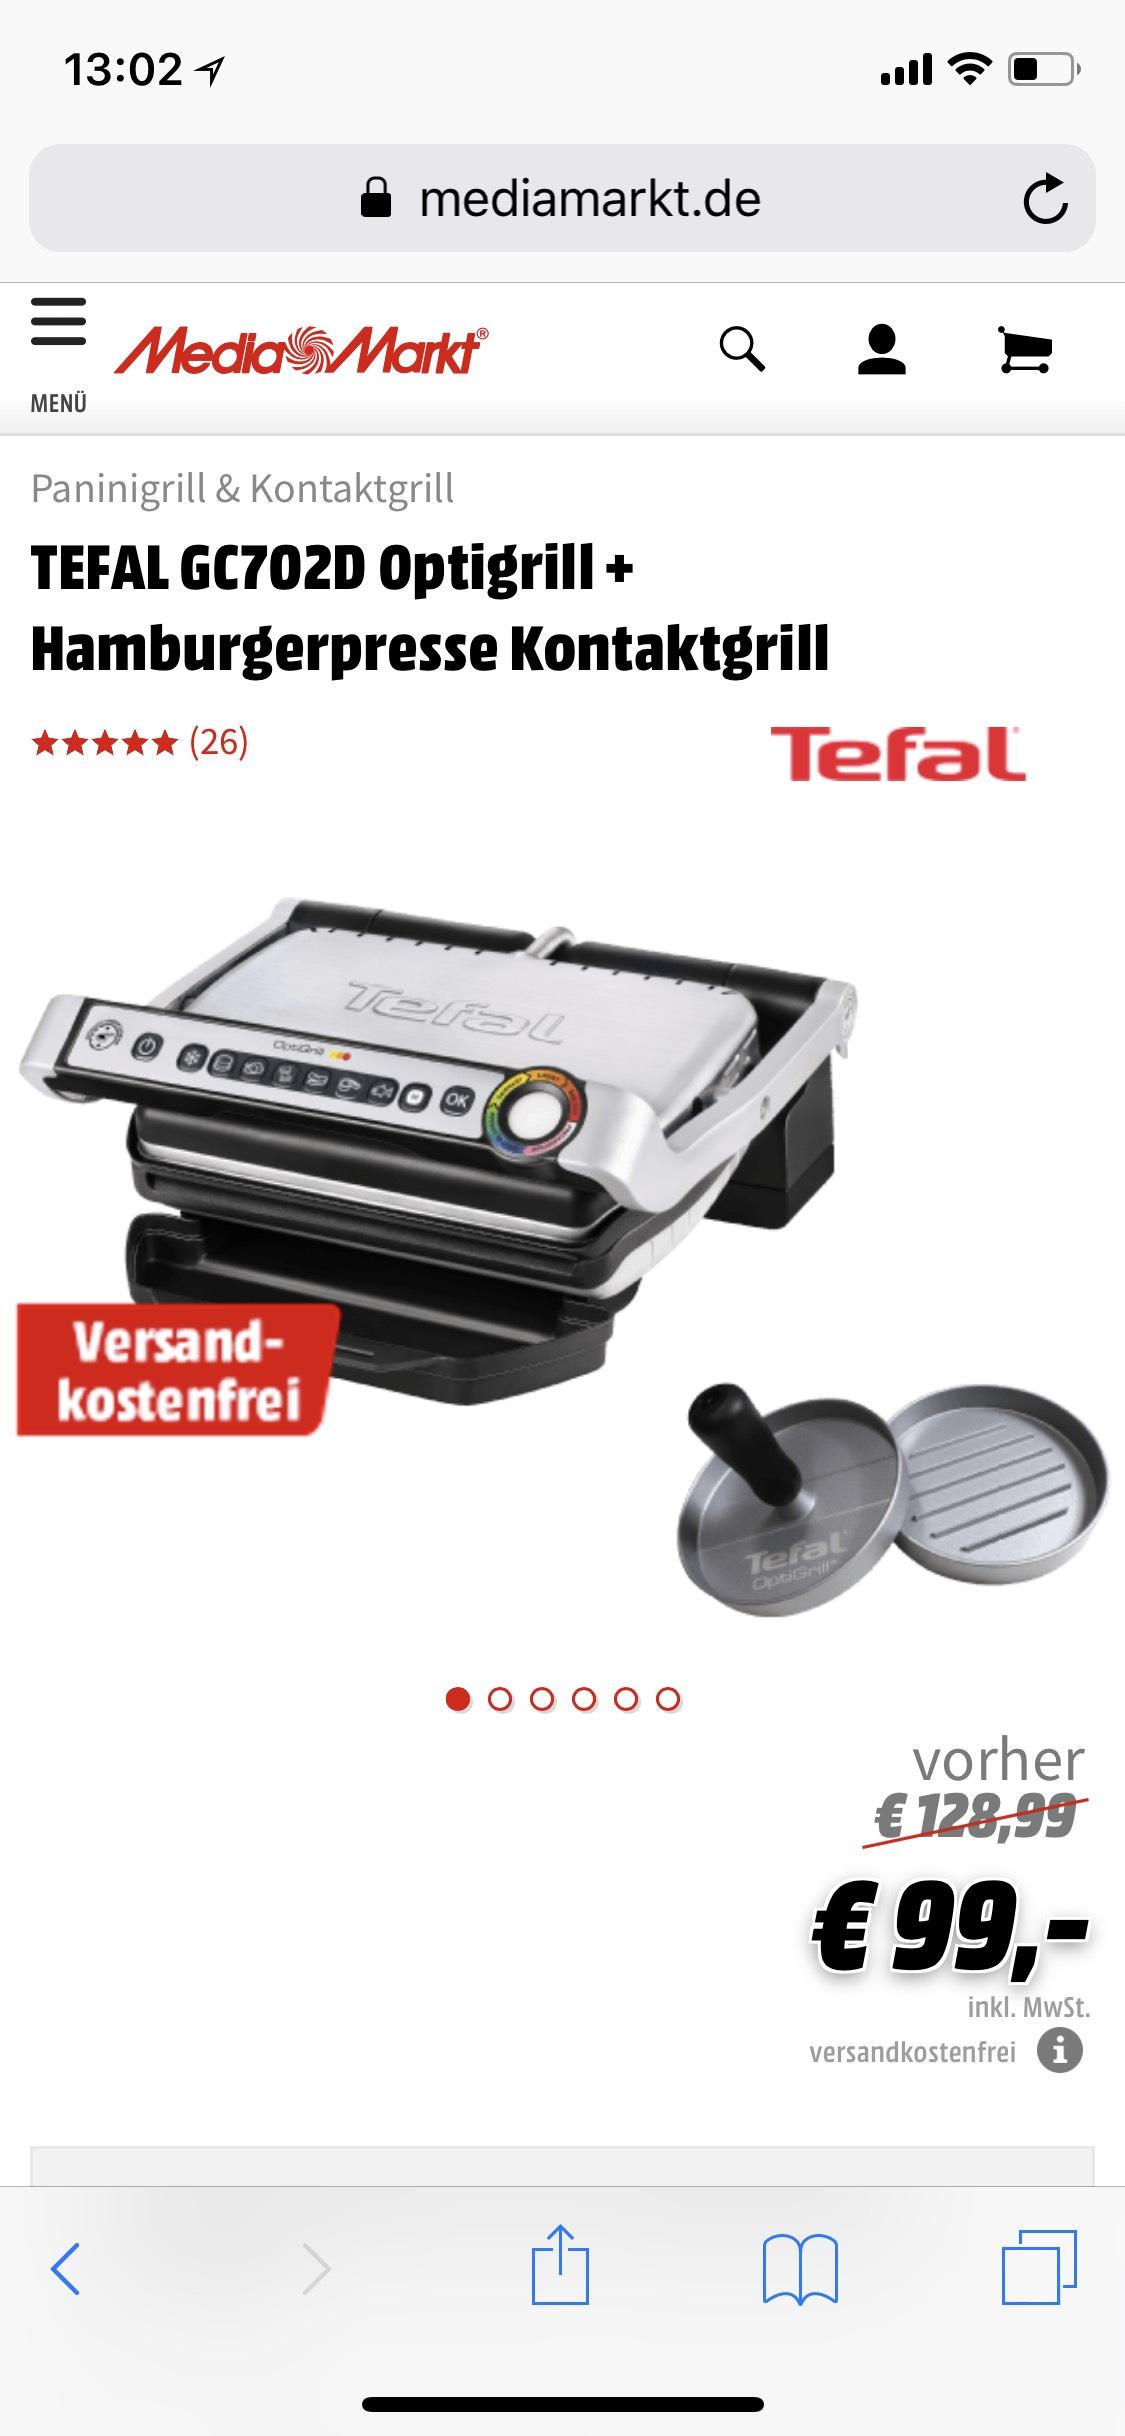 [MASTERPASS] TEFAL GC702D Optigrill + Hamburgerpresse Kontaktgrill